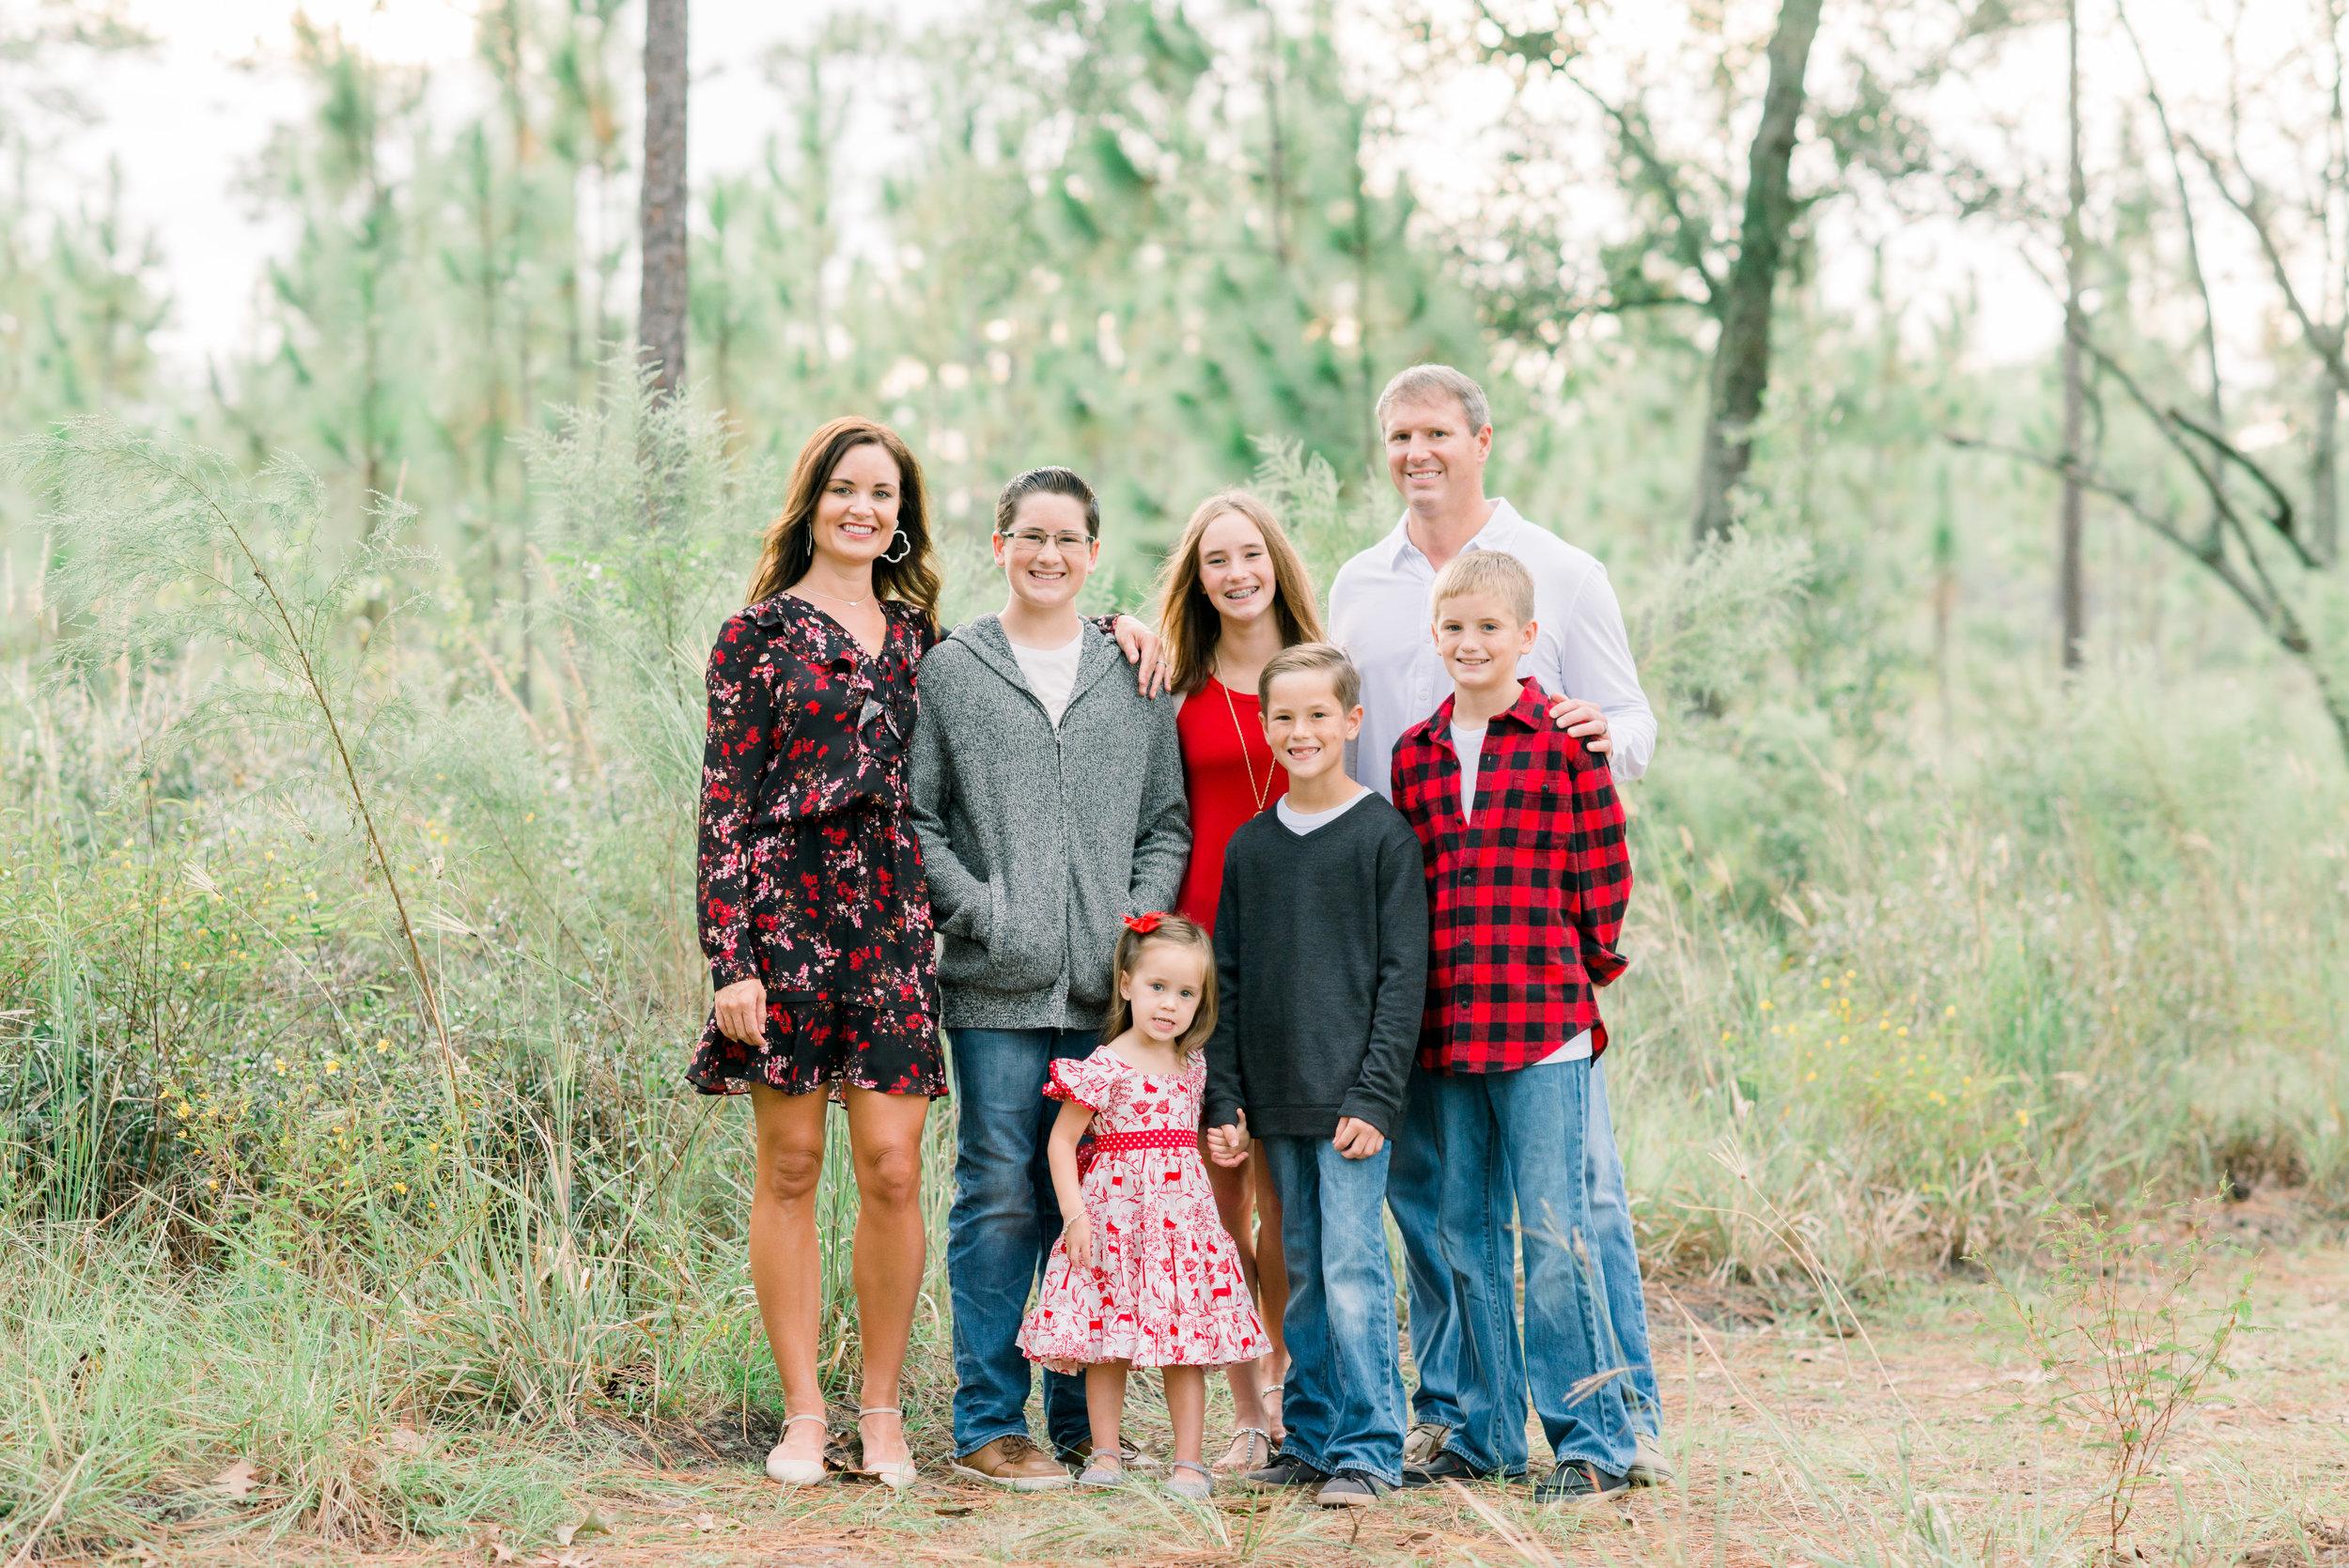 KateTaramykinStudios-Wekiva-Springs-Family-Photographer-Donald-6.jpg